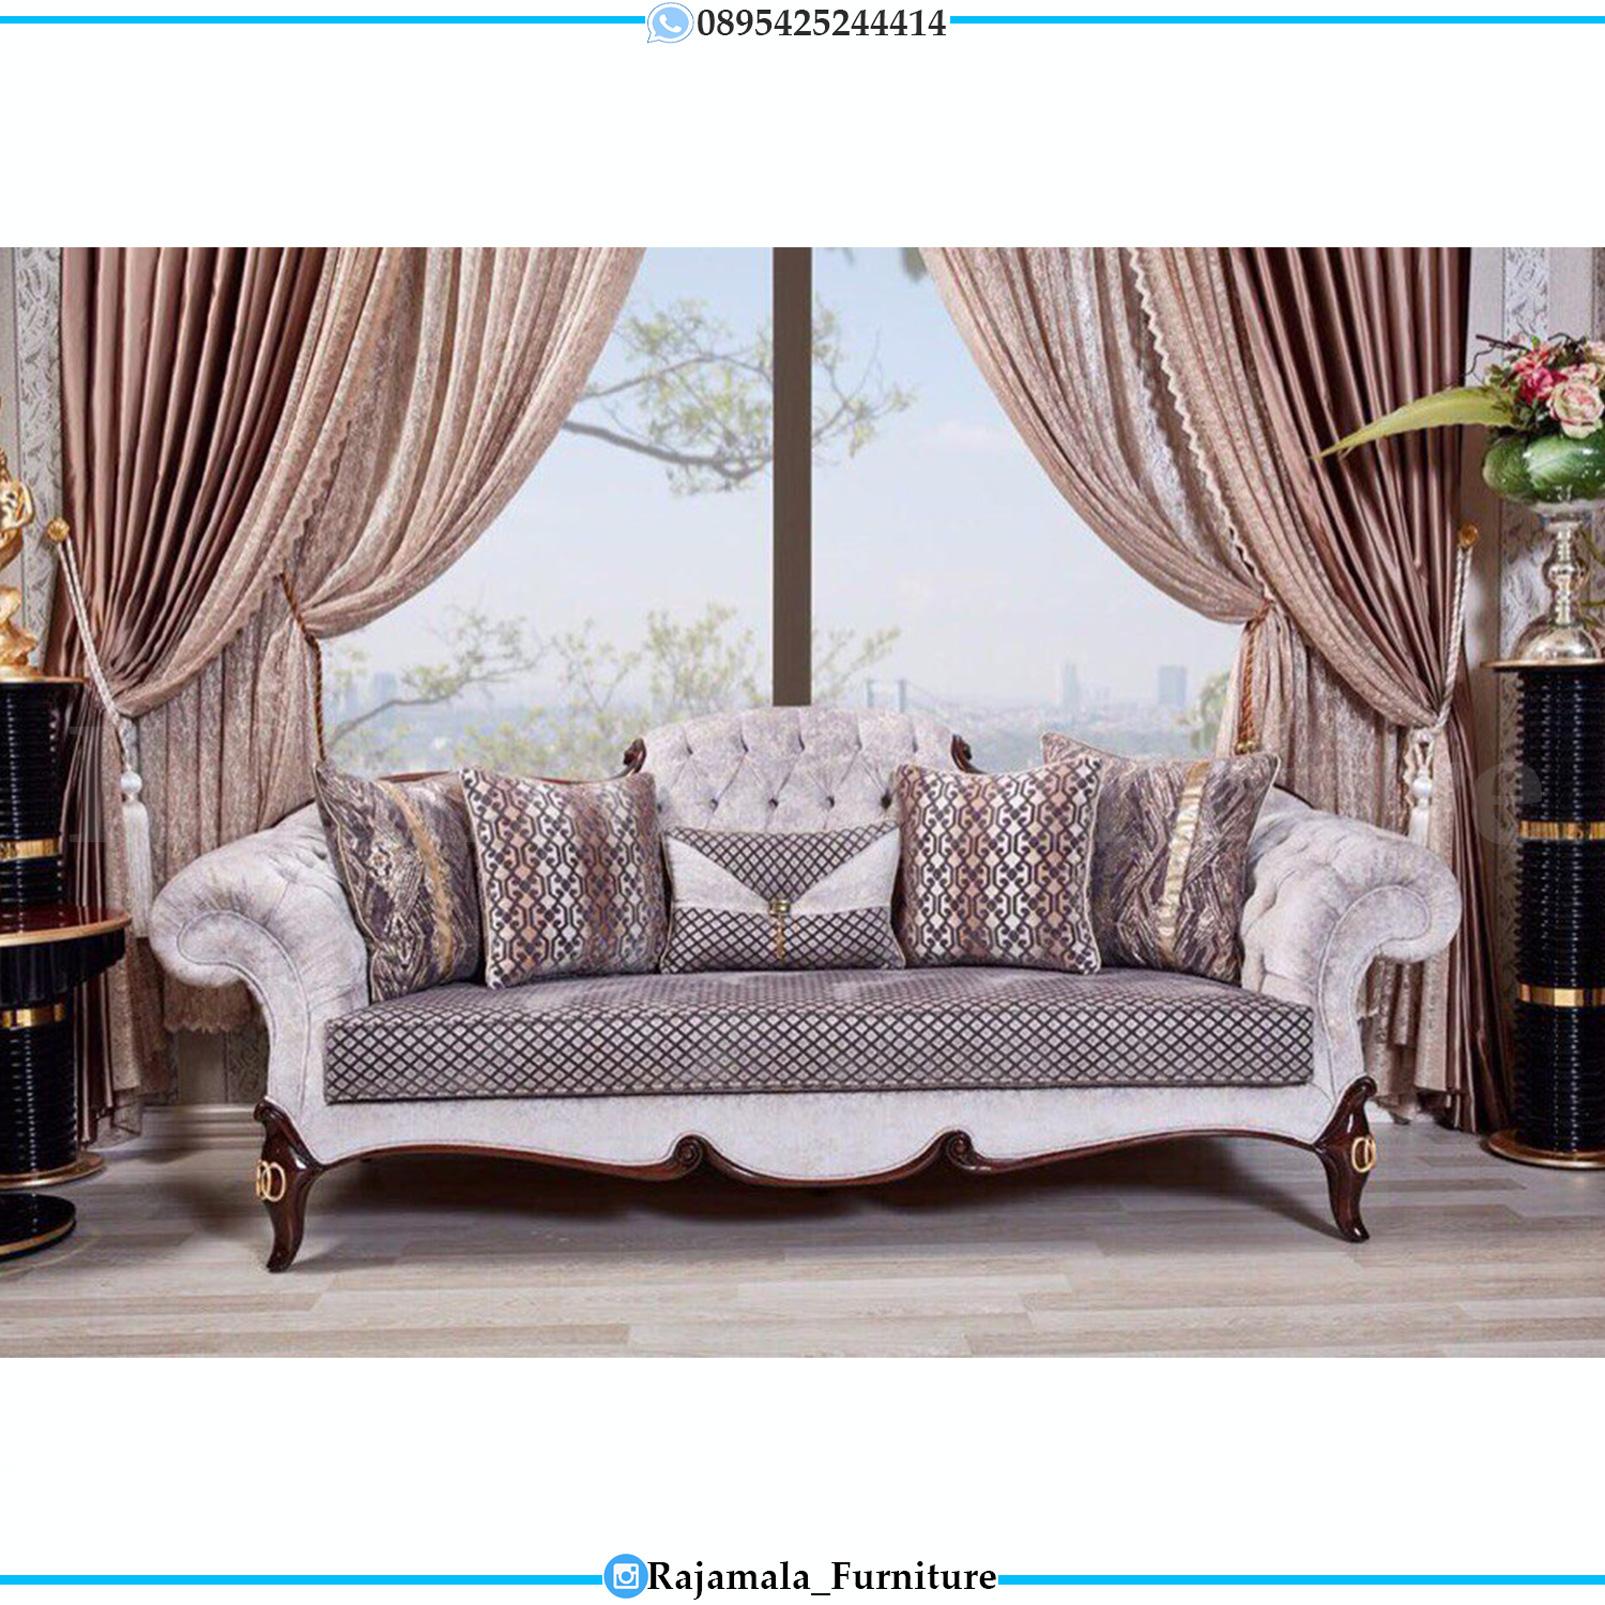 New Set Sofa Tamu Minimalis Jati Natural Classic Luxury RM-0155